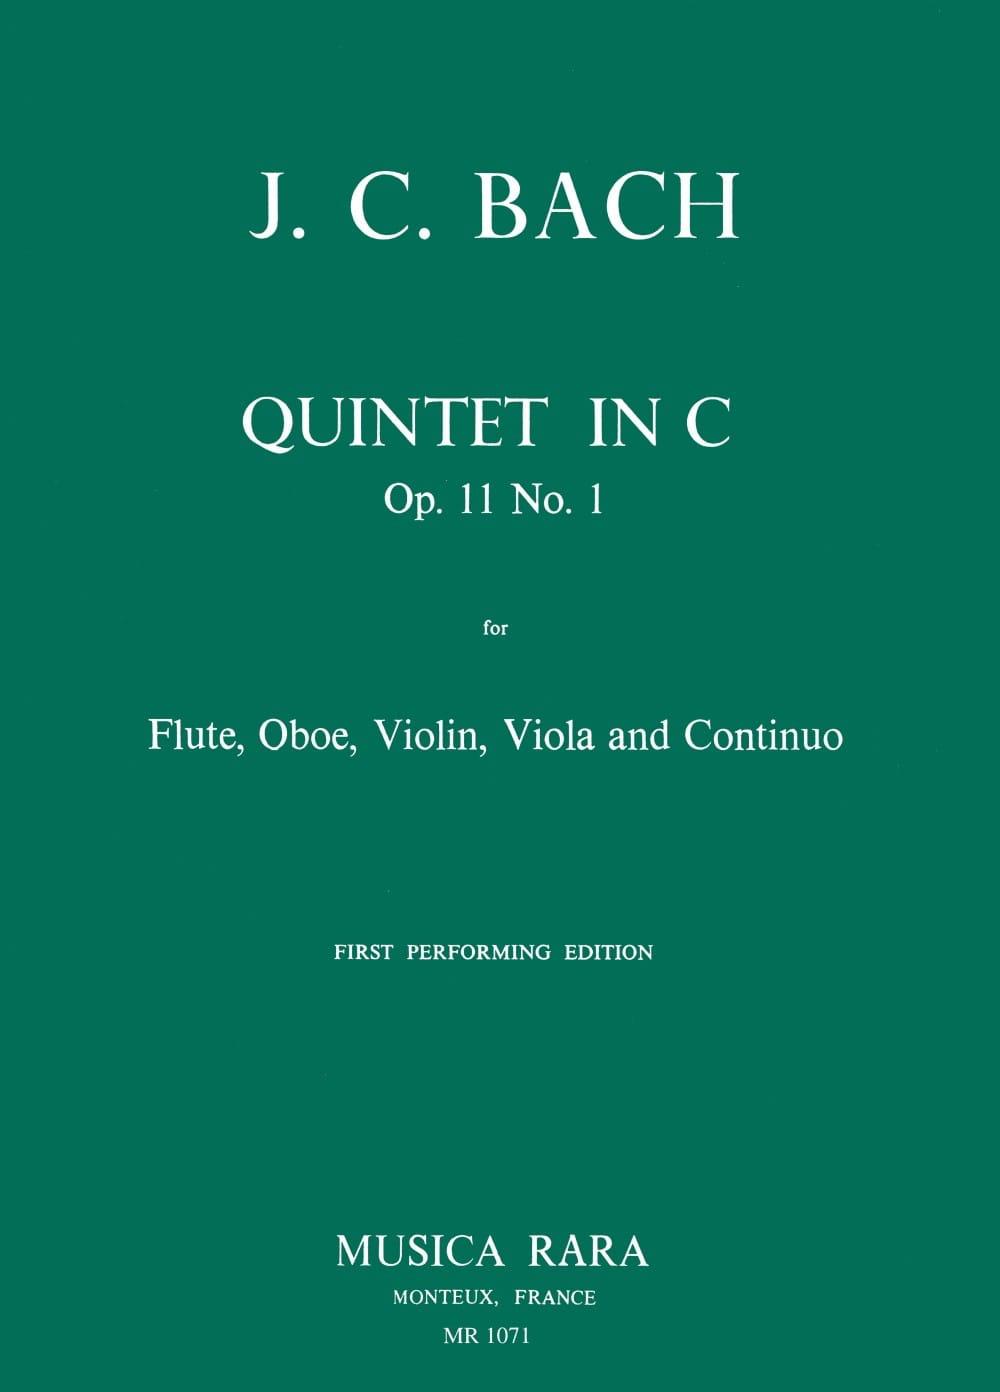 Johann Christian Bach - Quintet in C op. 11 n° 1 -Flute oboe violin viola Bc - Partition - di-arezzo.fr